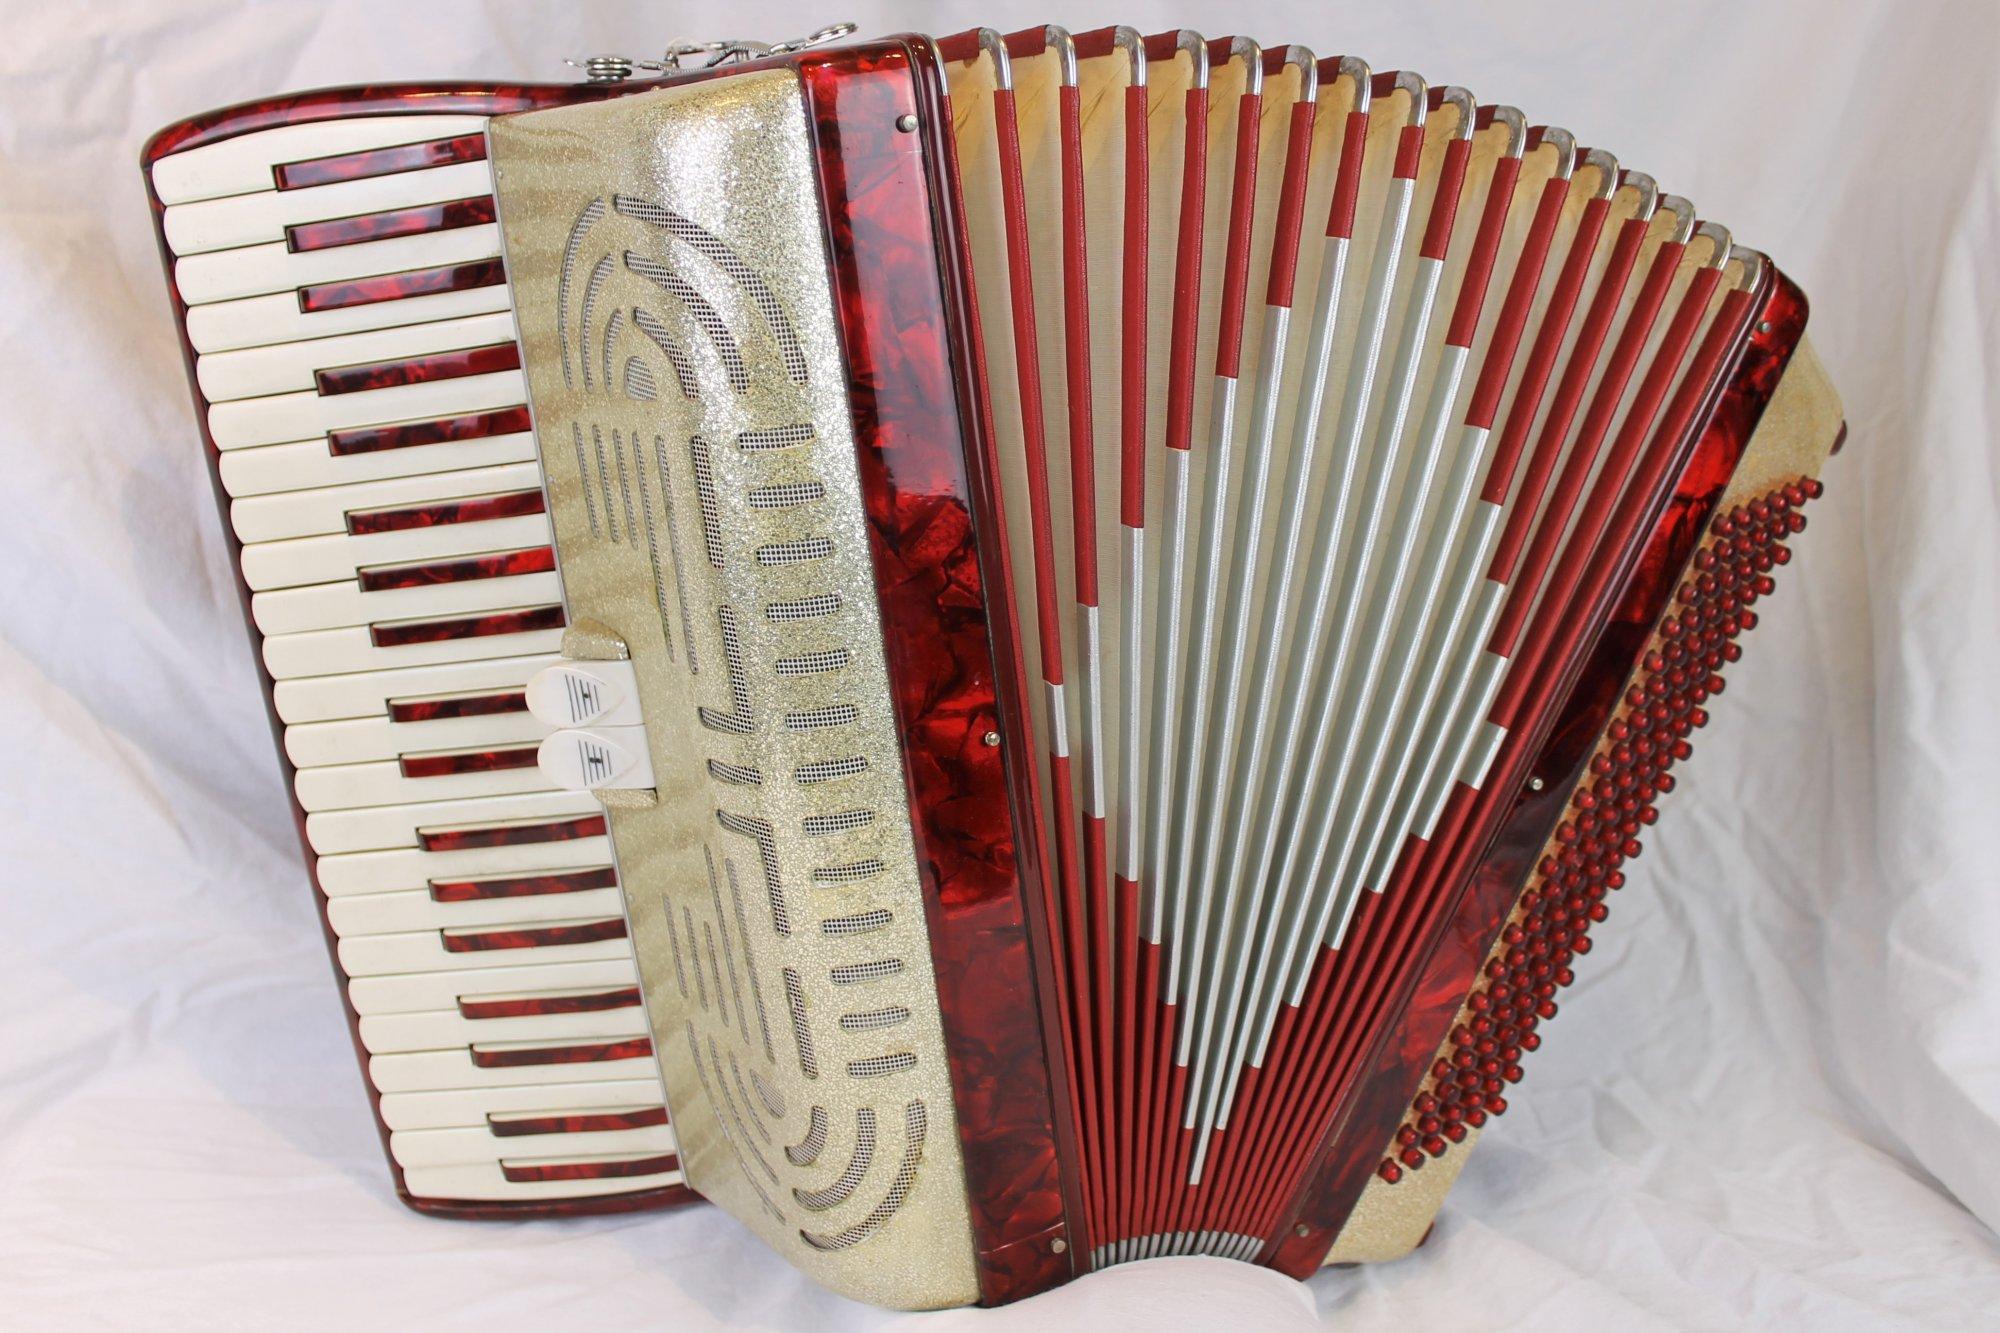 4404 - Red Gold Italian Piano Accordion LM 41 120